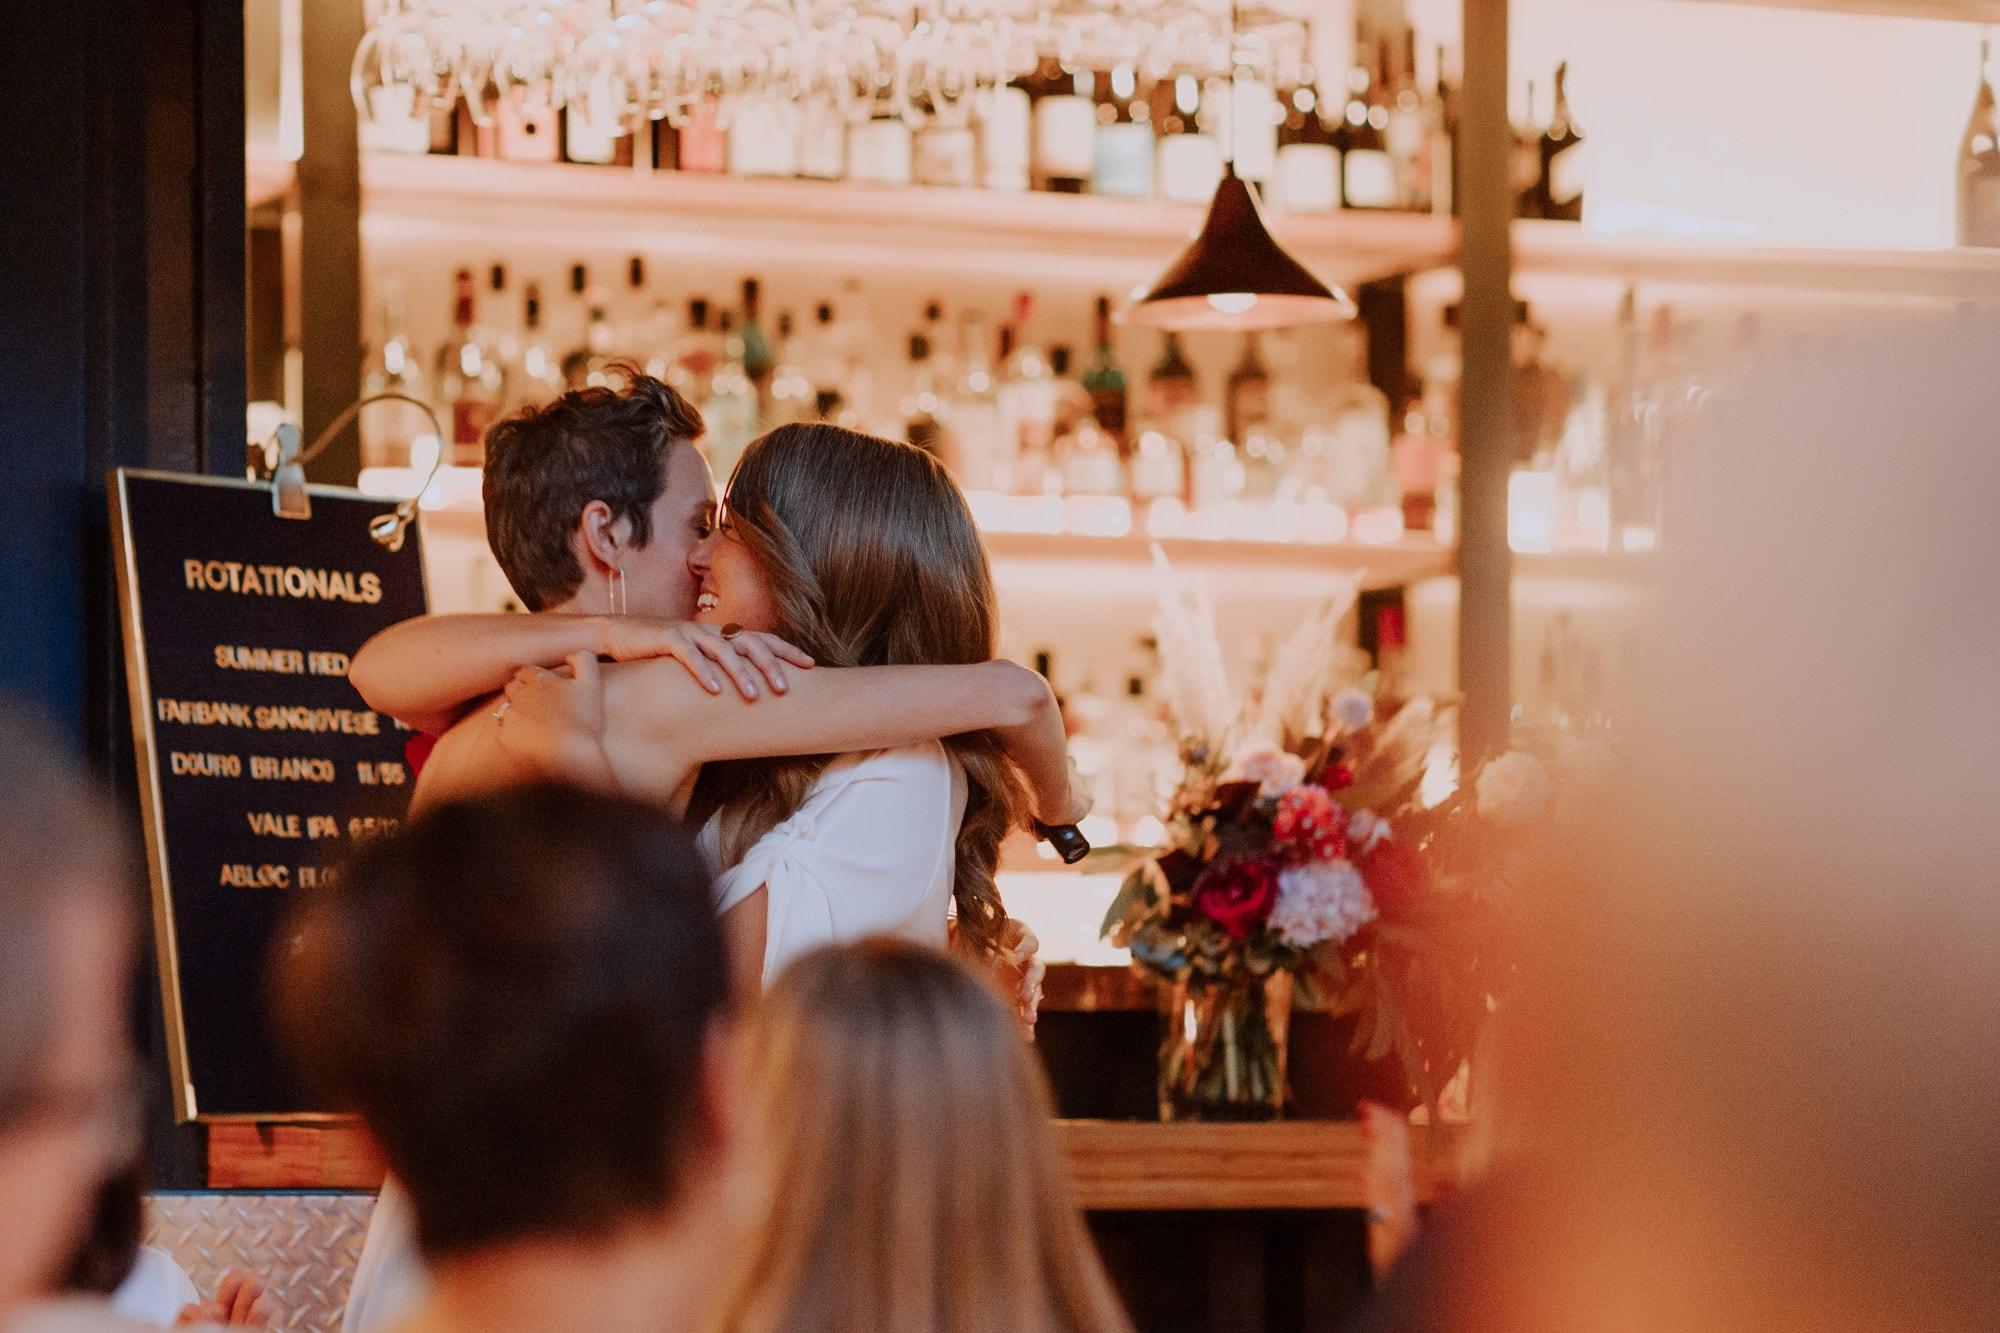 Jackson Grant Weddings - Melbourne Wedding Photographer - LGBTQ - Dancing With Her (31)